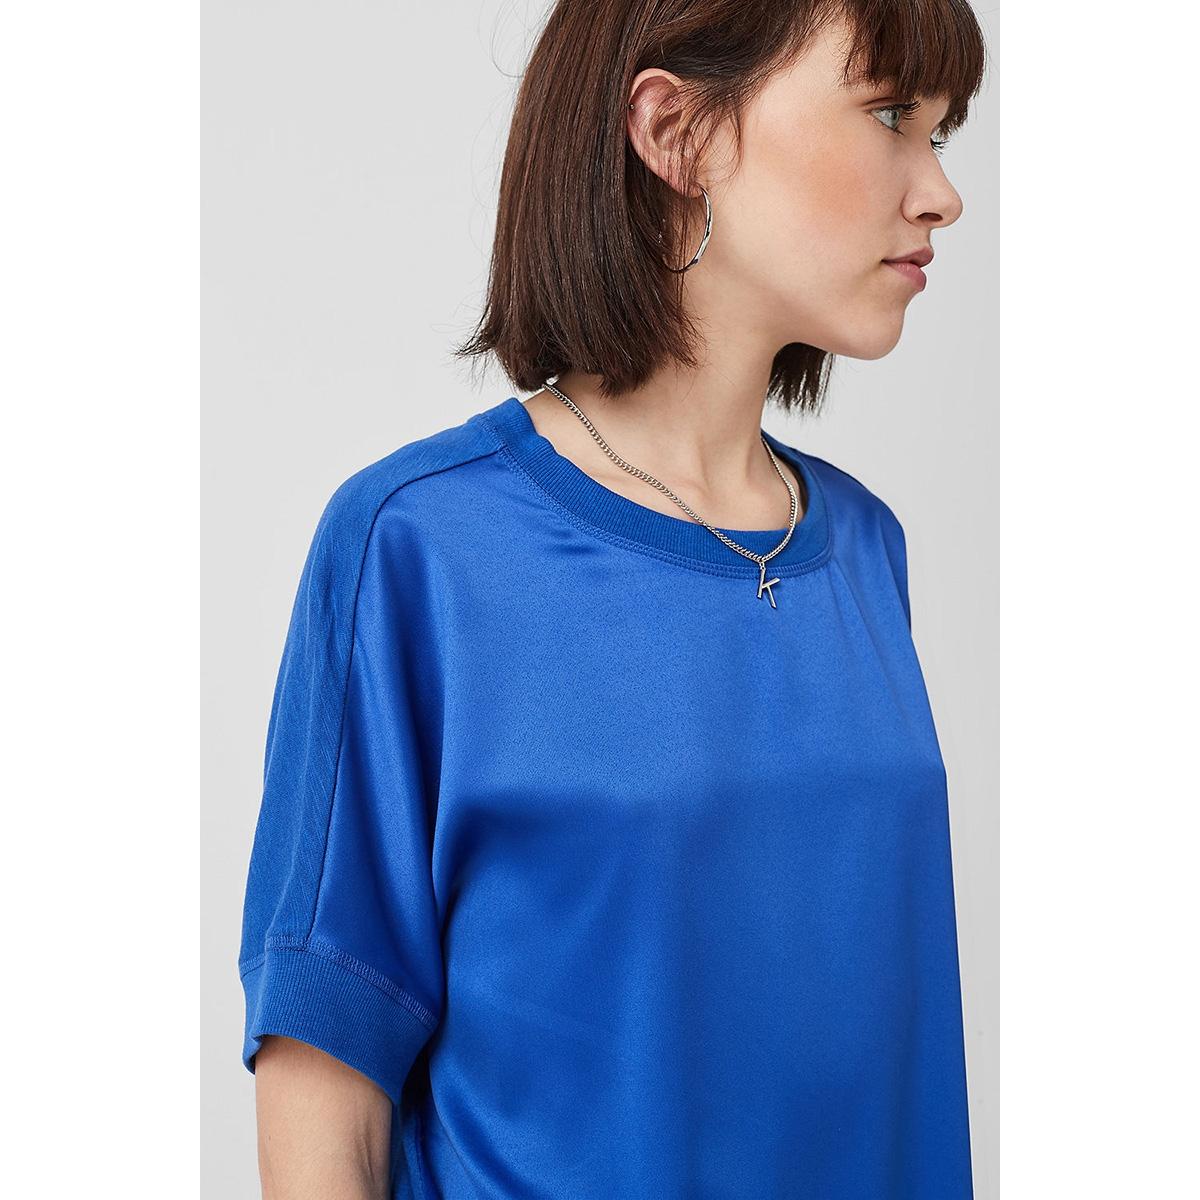 shirt met vleermuismouwen 41908325426 q/s designed by t-shirt 5593